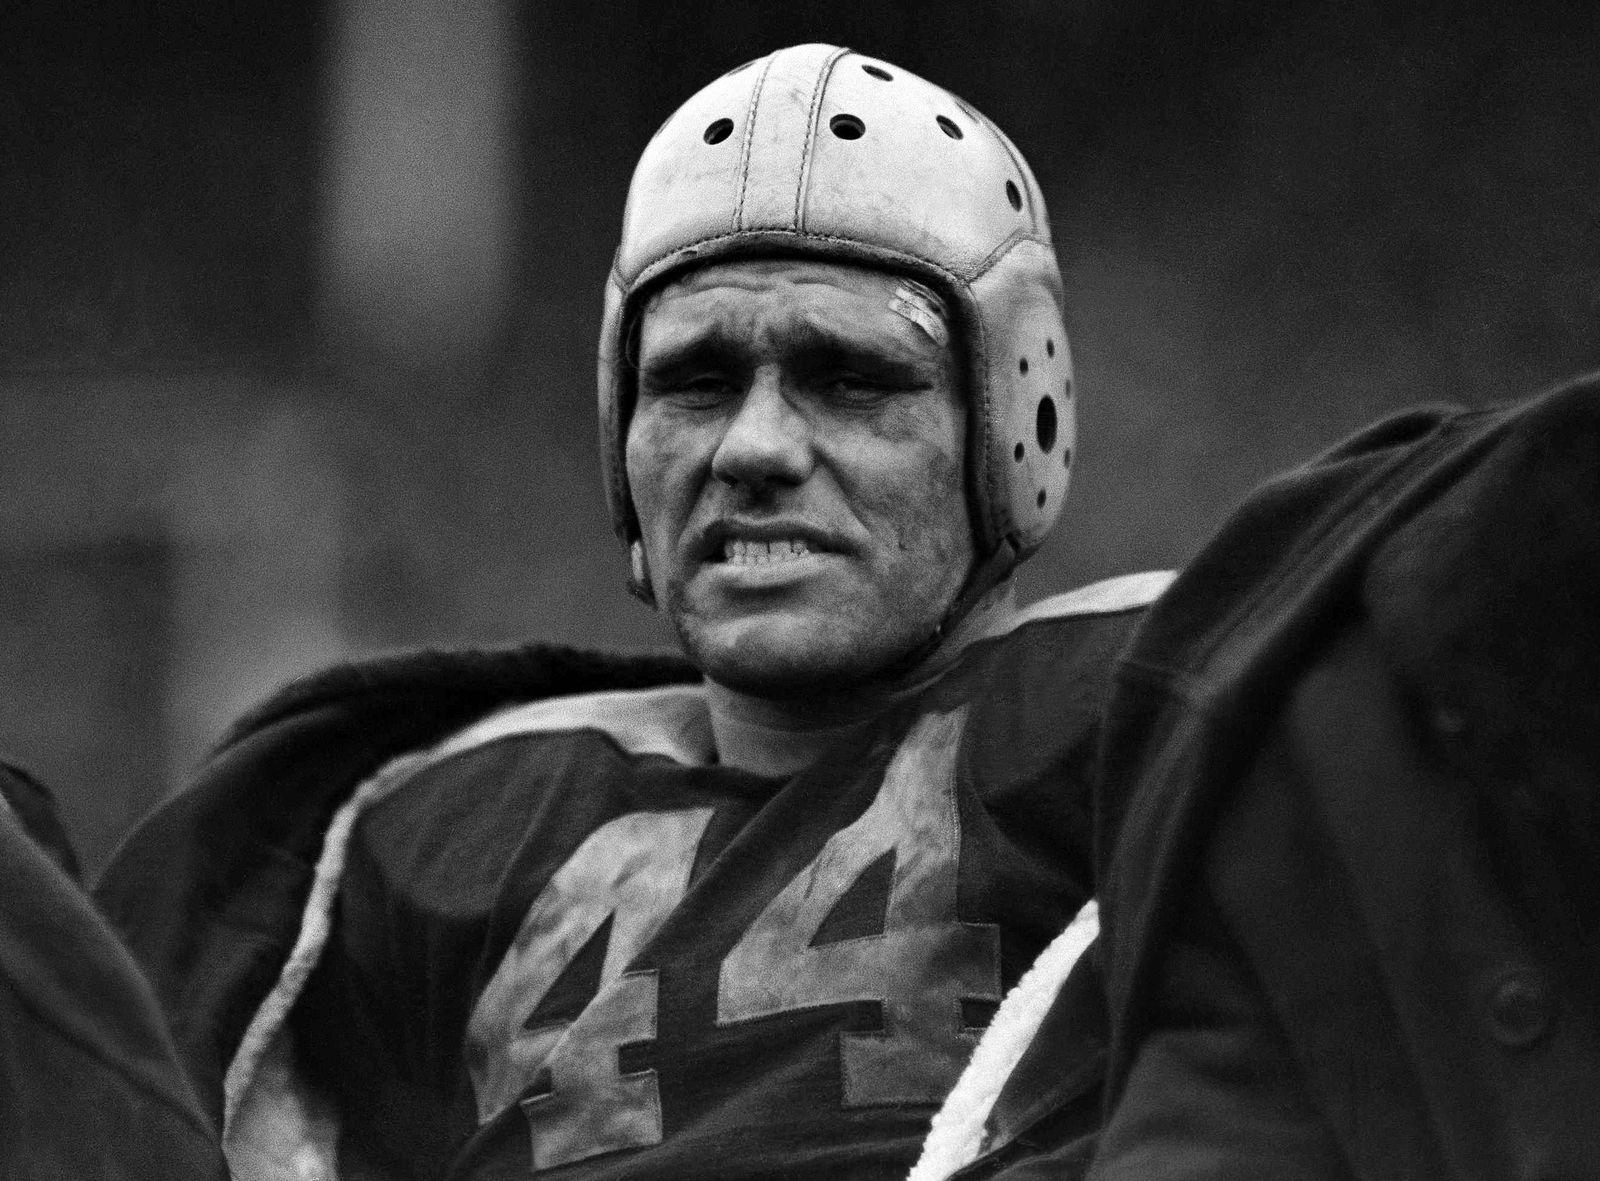 NFL At 100-Uniforms Football